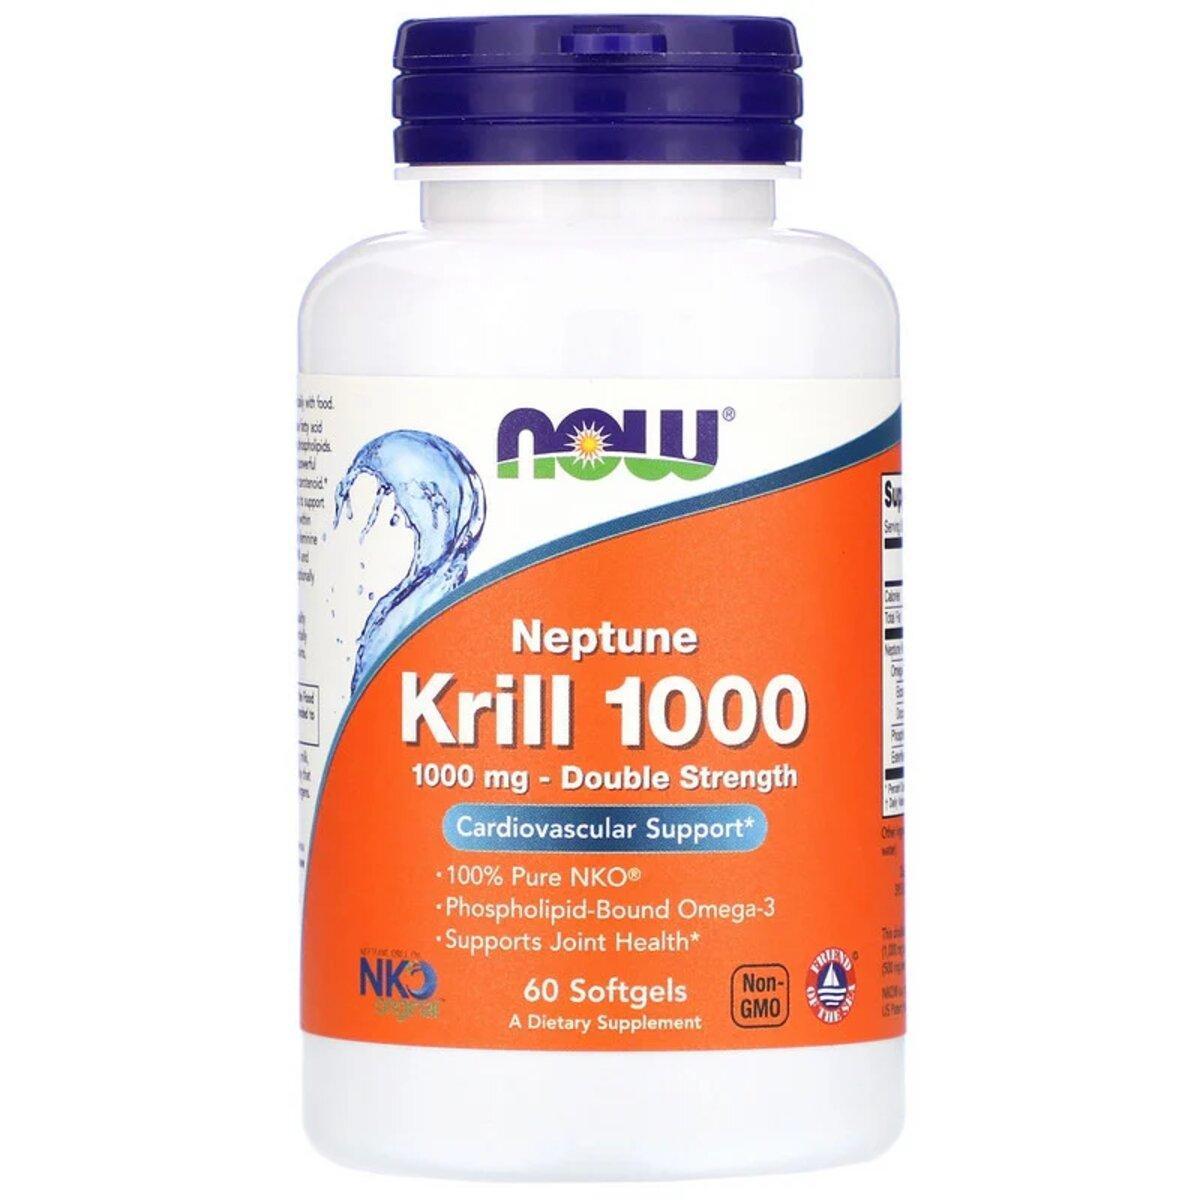 Крилевый Жир 1000мг, Neptune Krill 1000, Double Strength, Now Foods, 60 желатиновых капсул